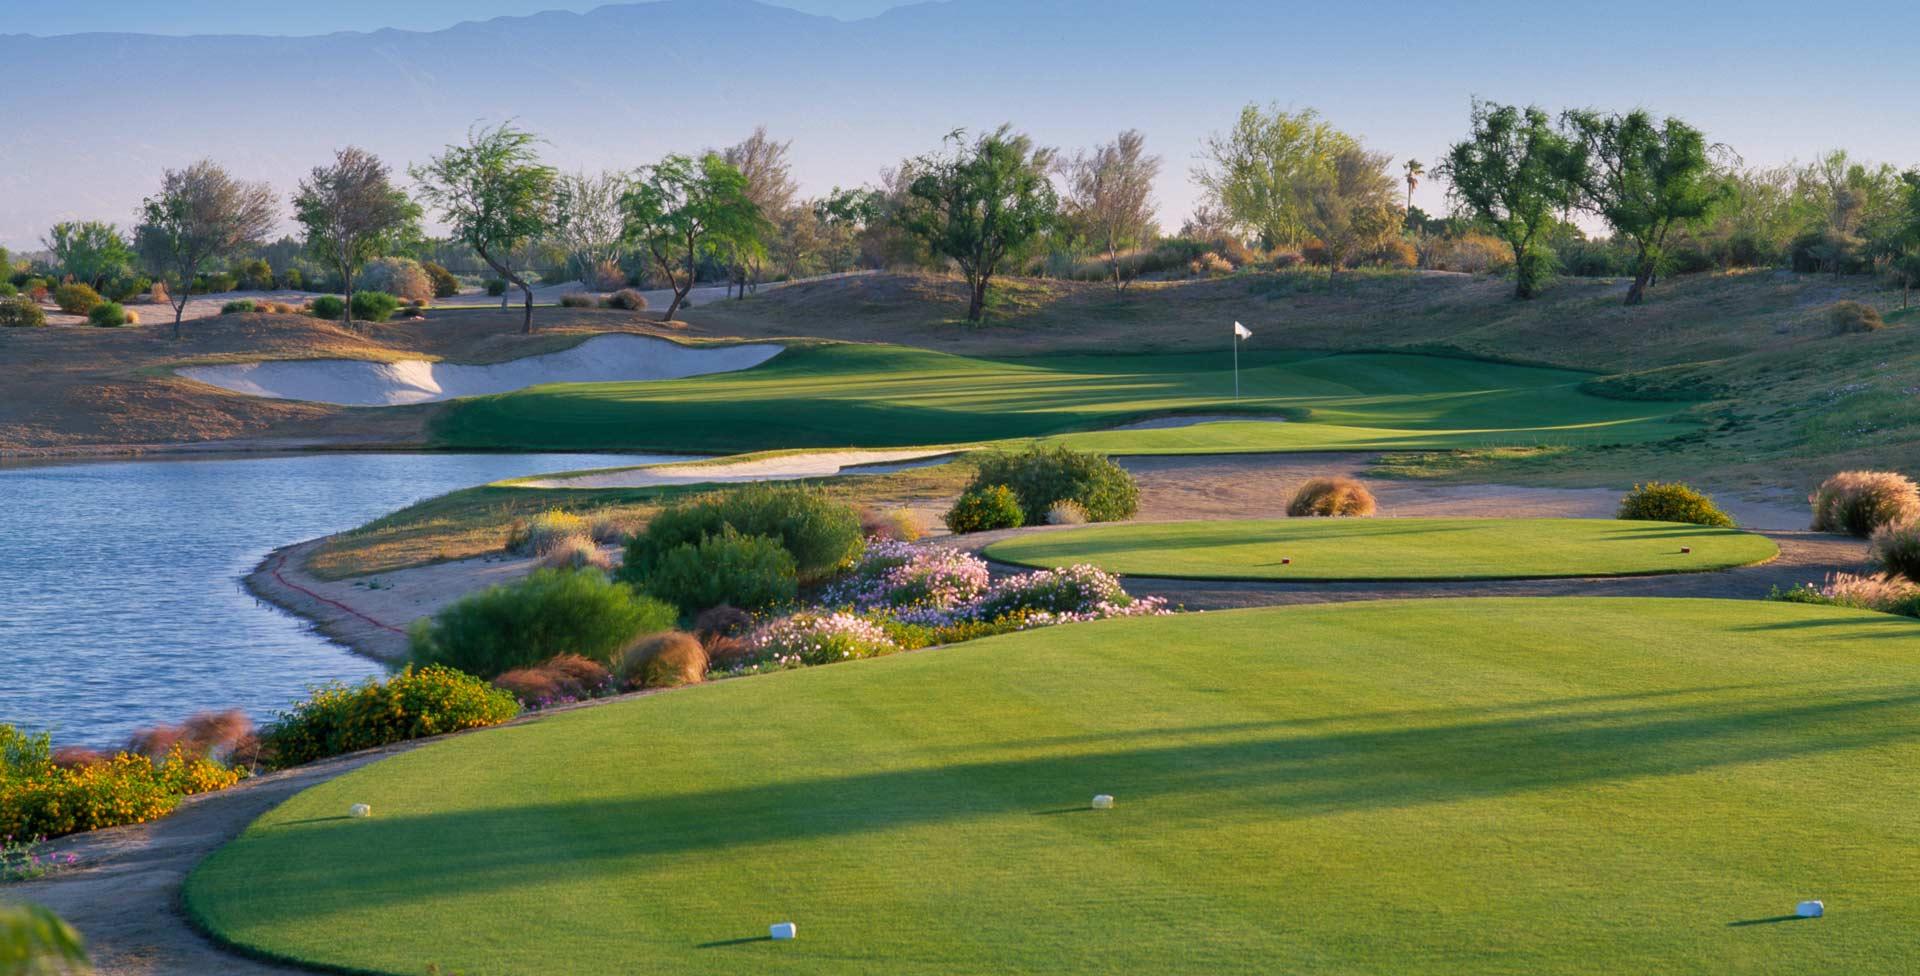 Pga Golf Courses West Palm Beach